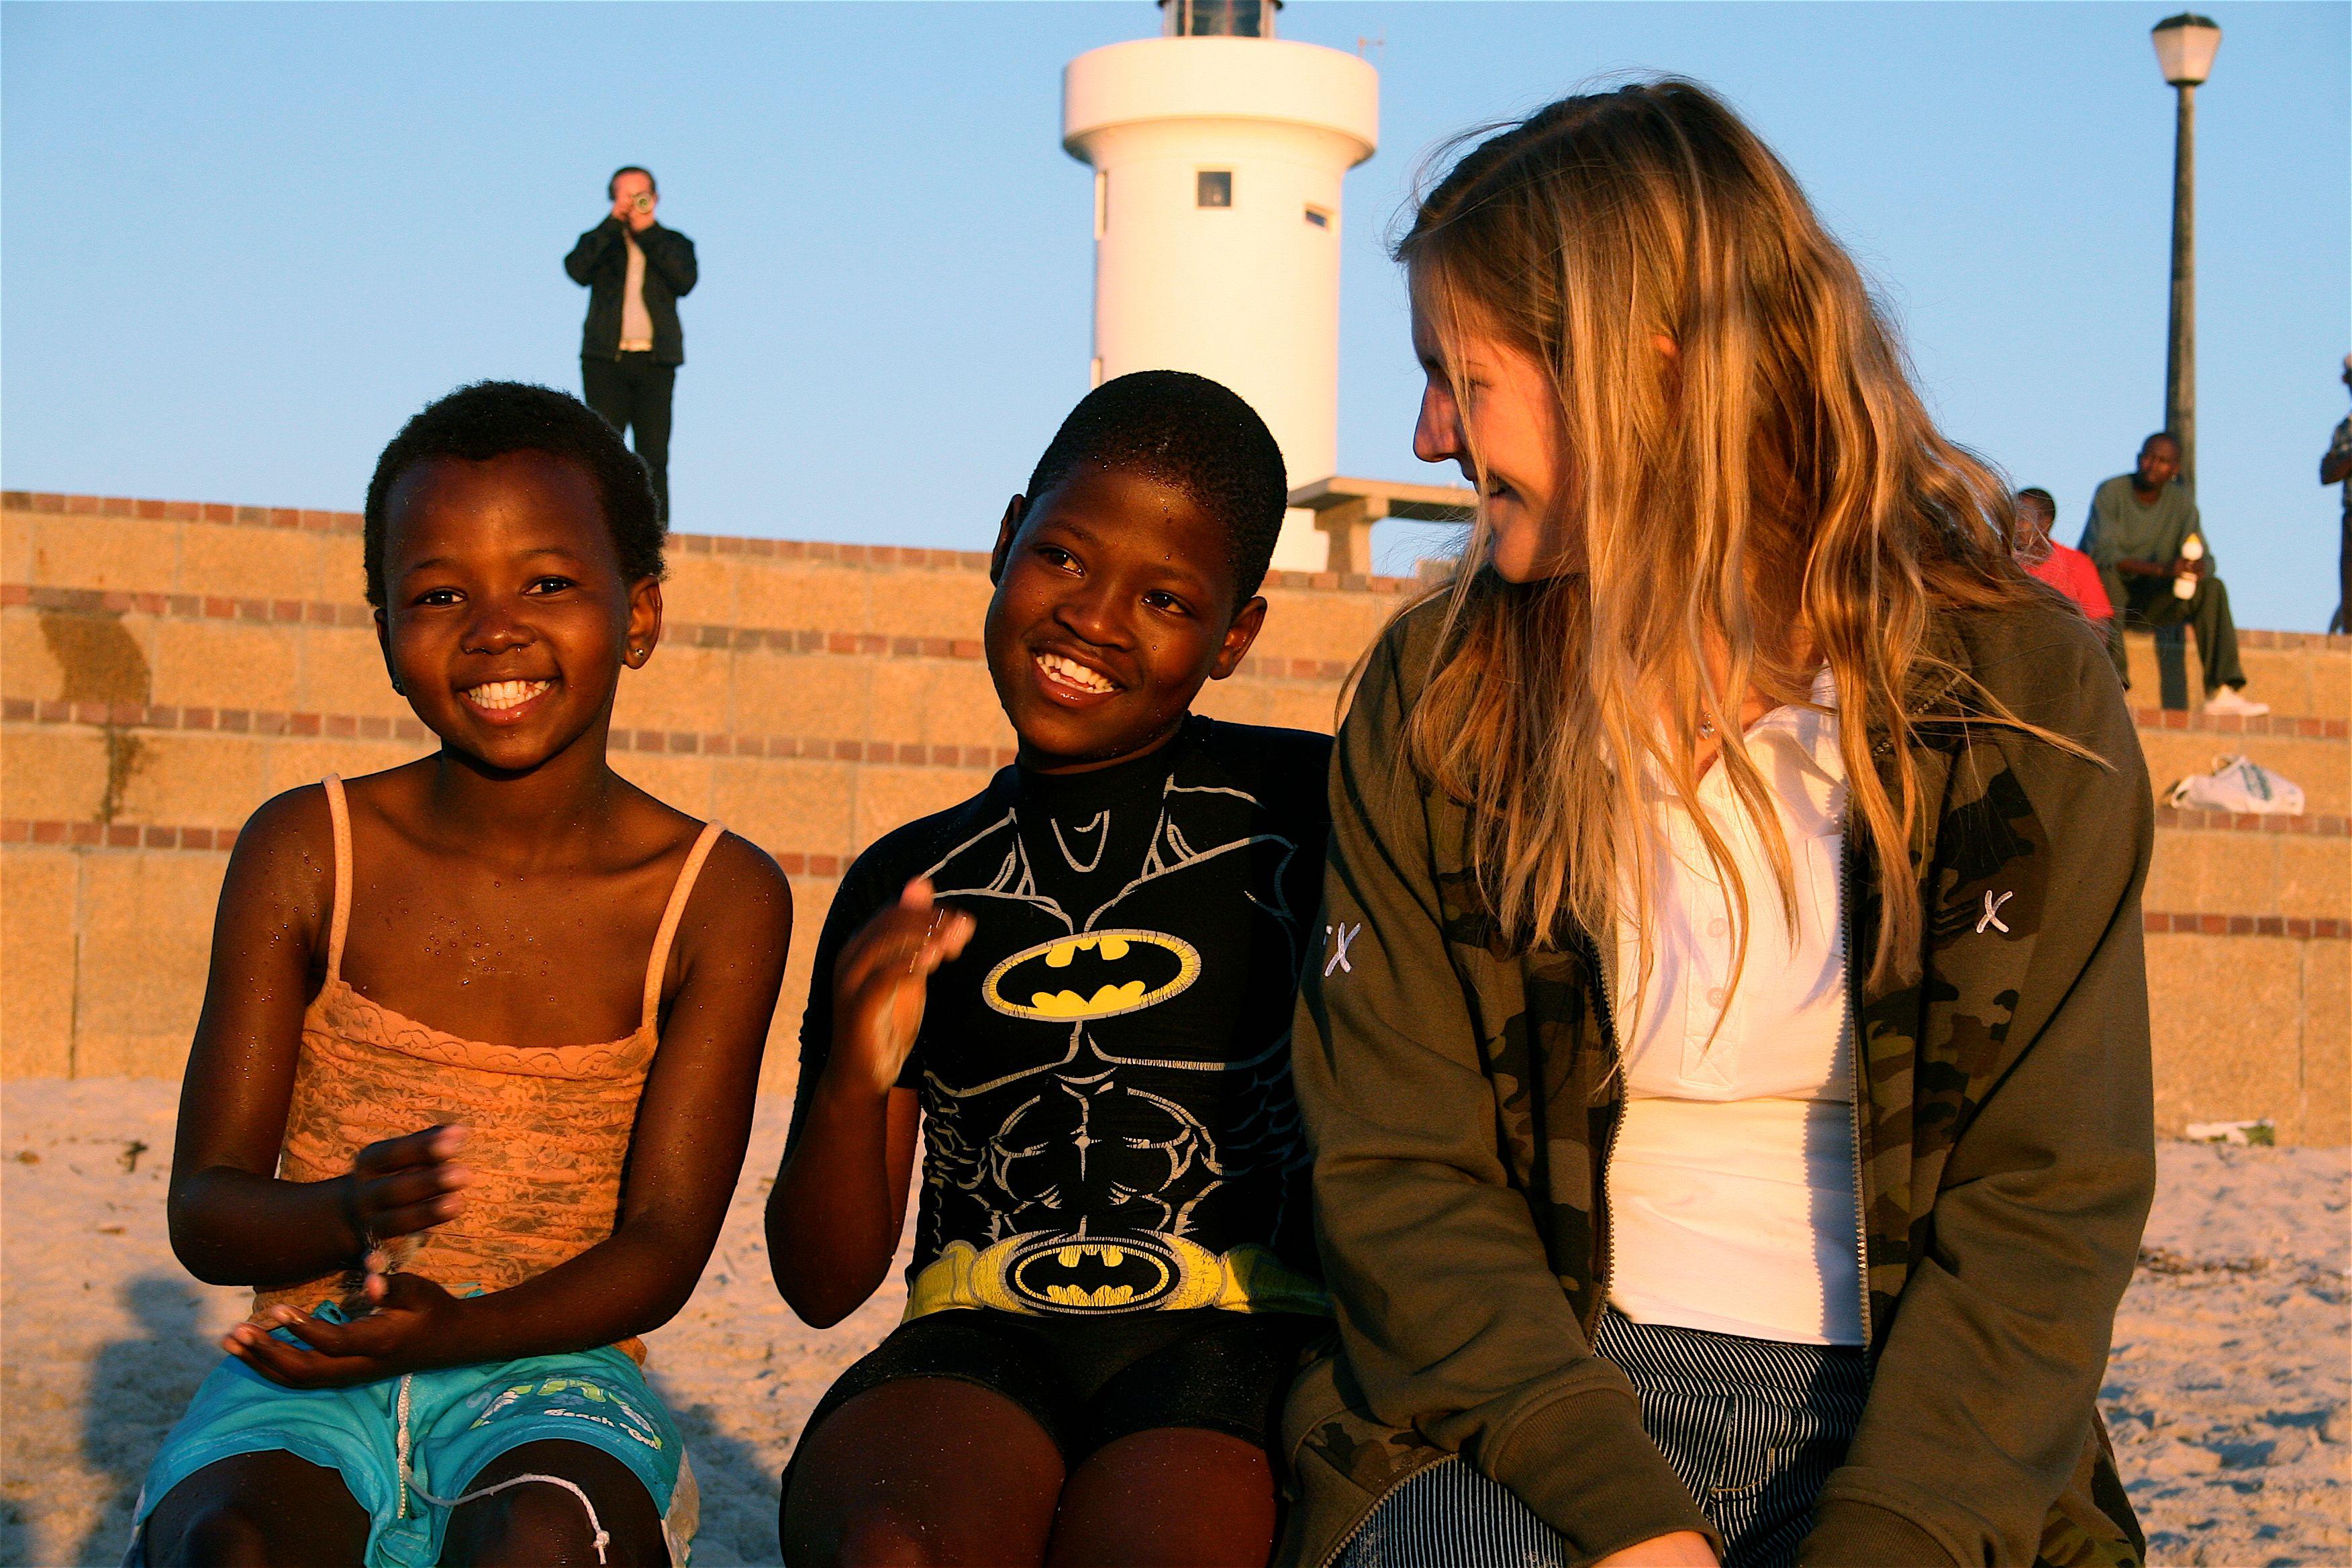 Jente med to barn på stranden (www.colourbox.com)